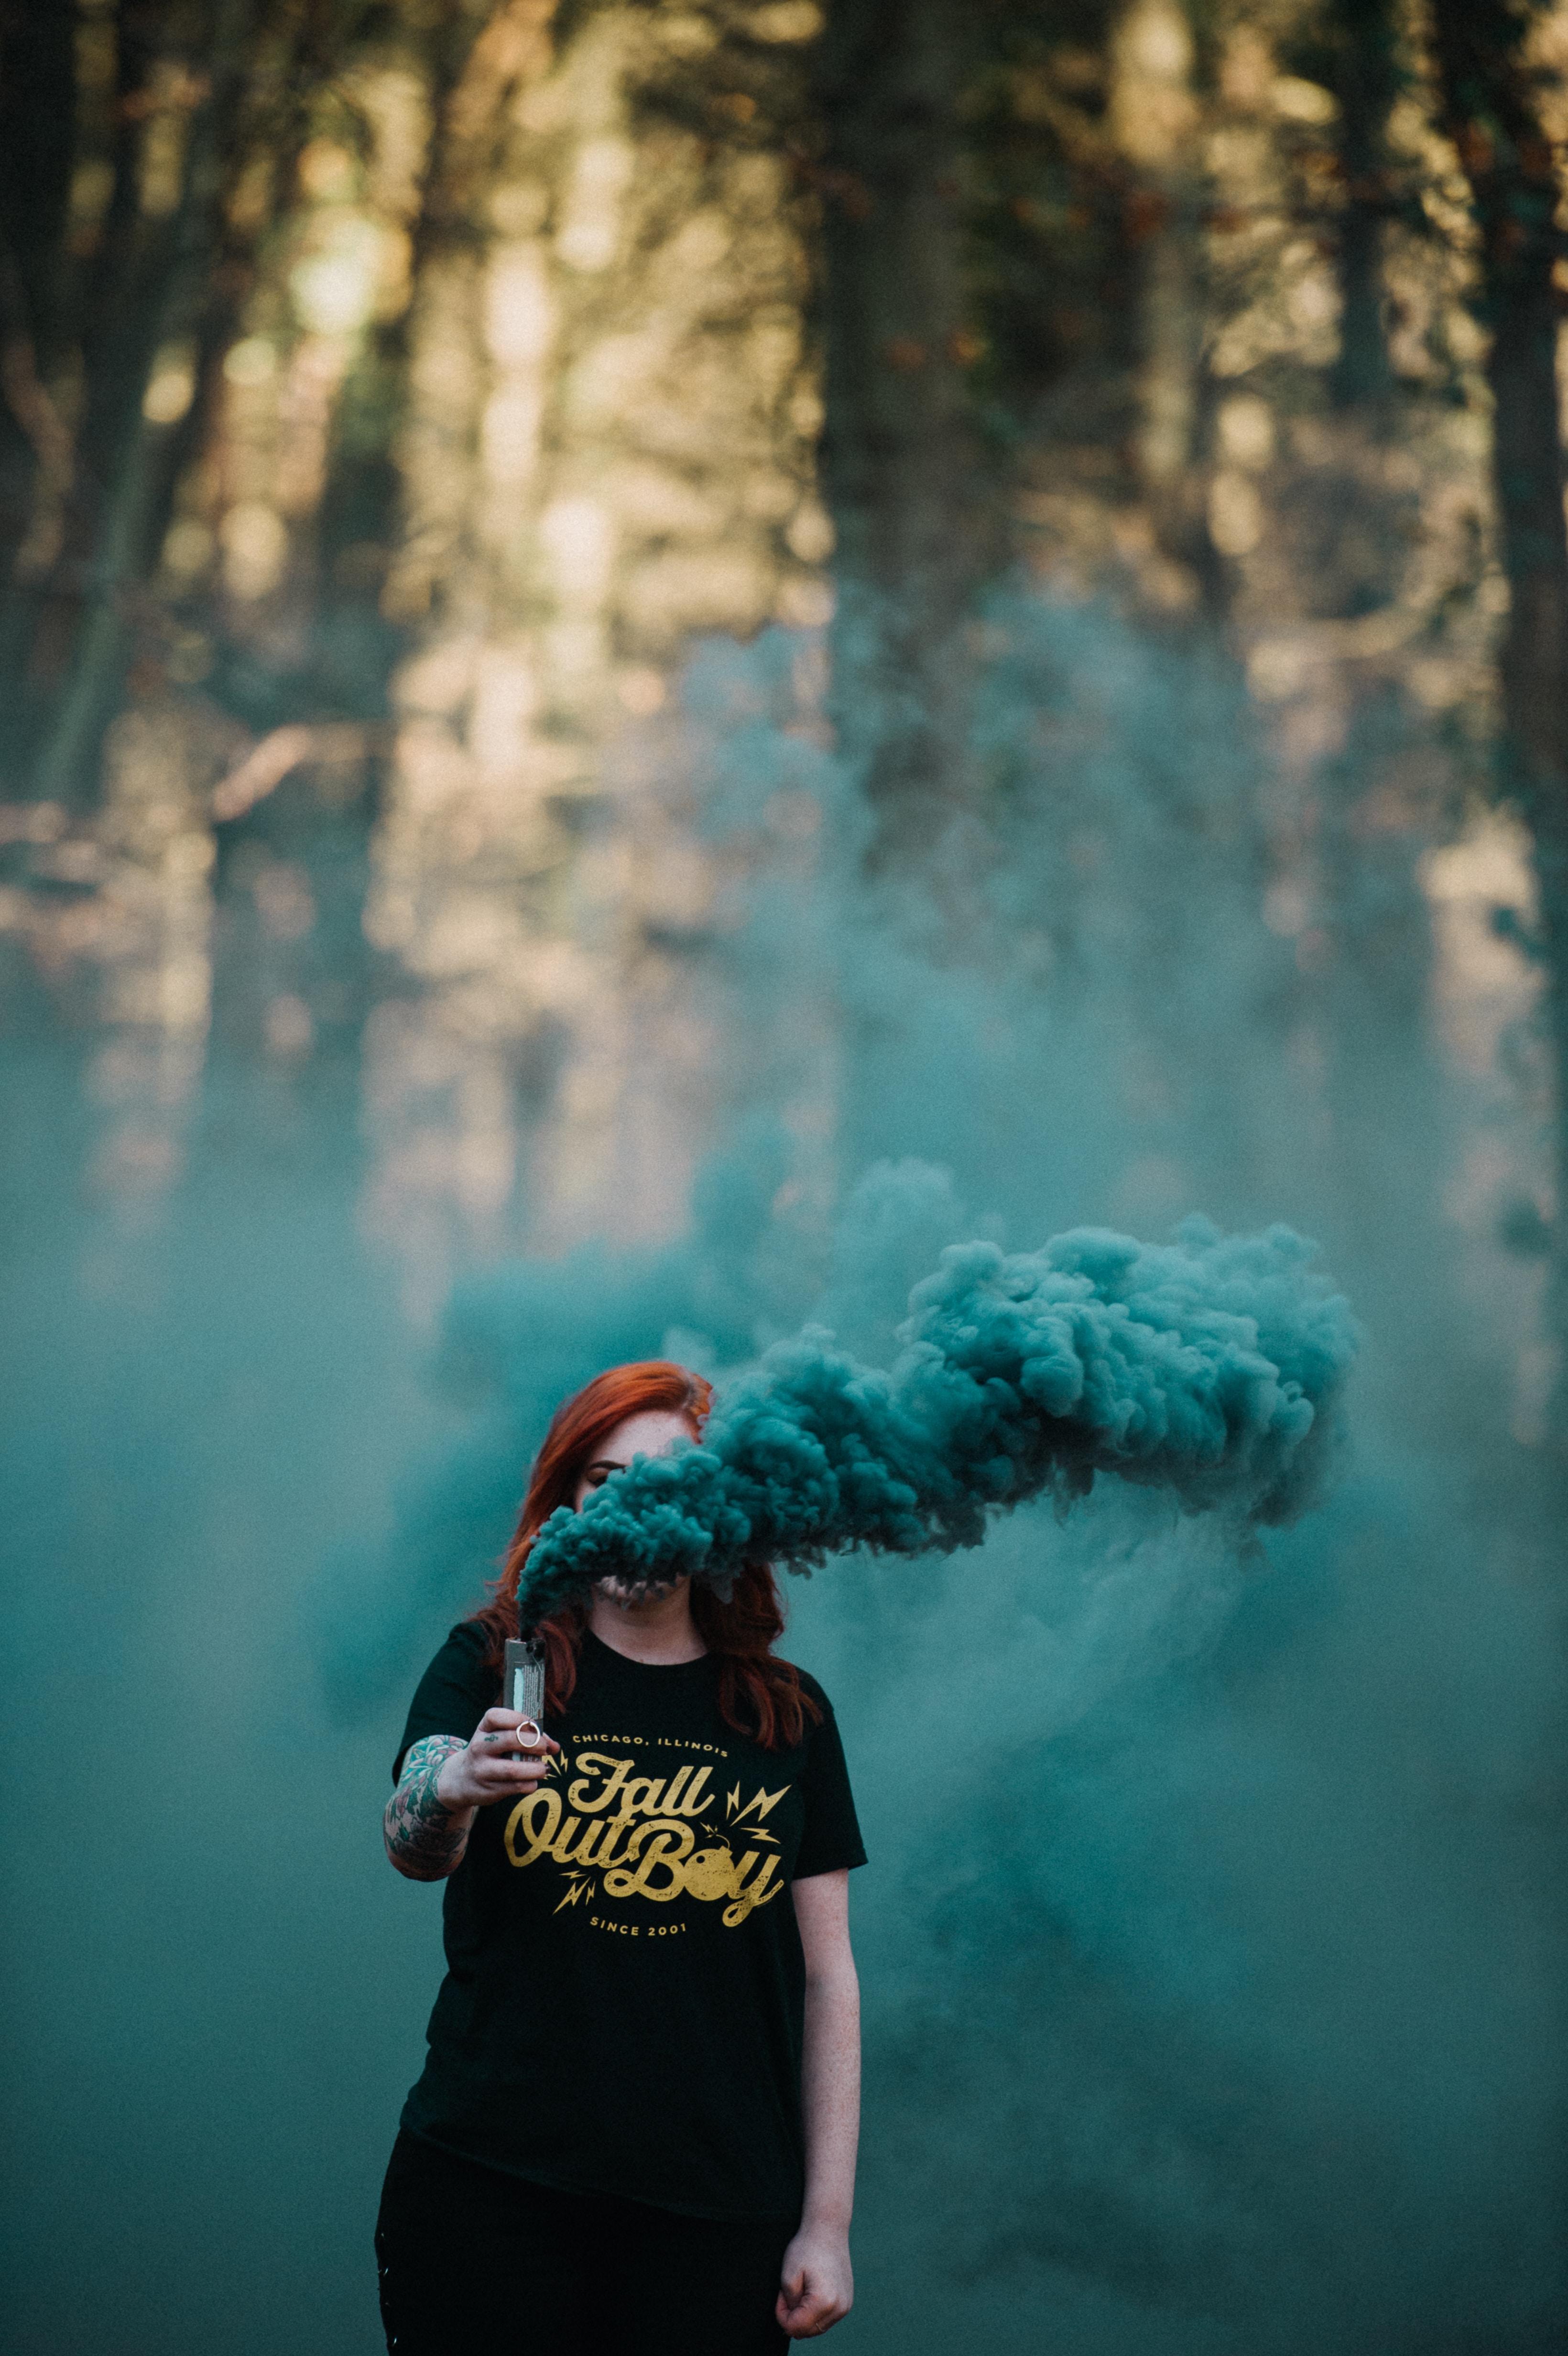 woman holding vaporizer releasing blue smoke near forest